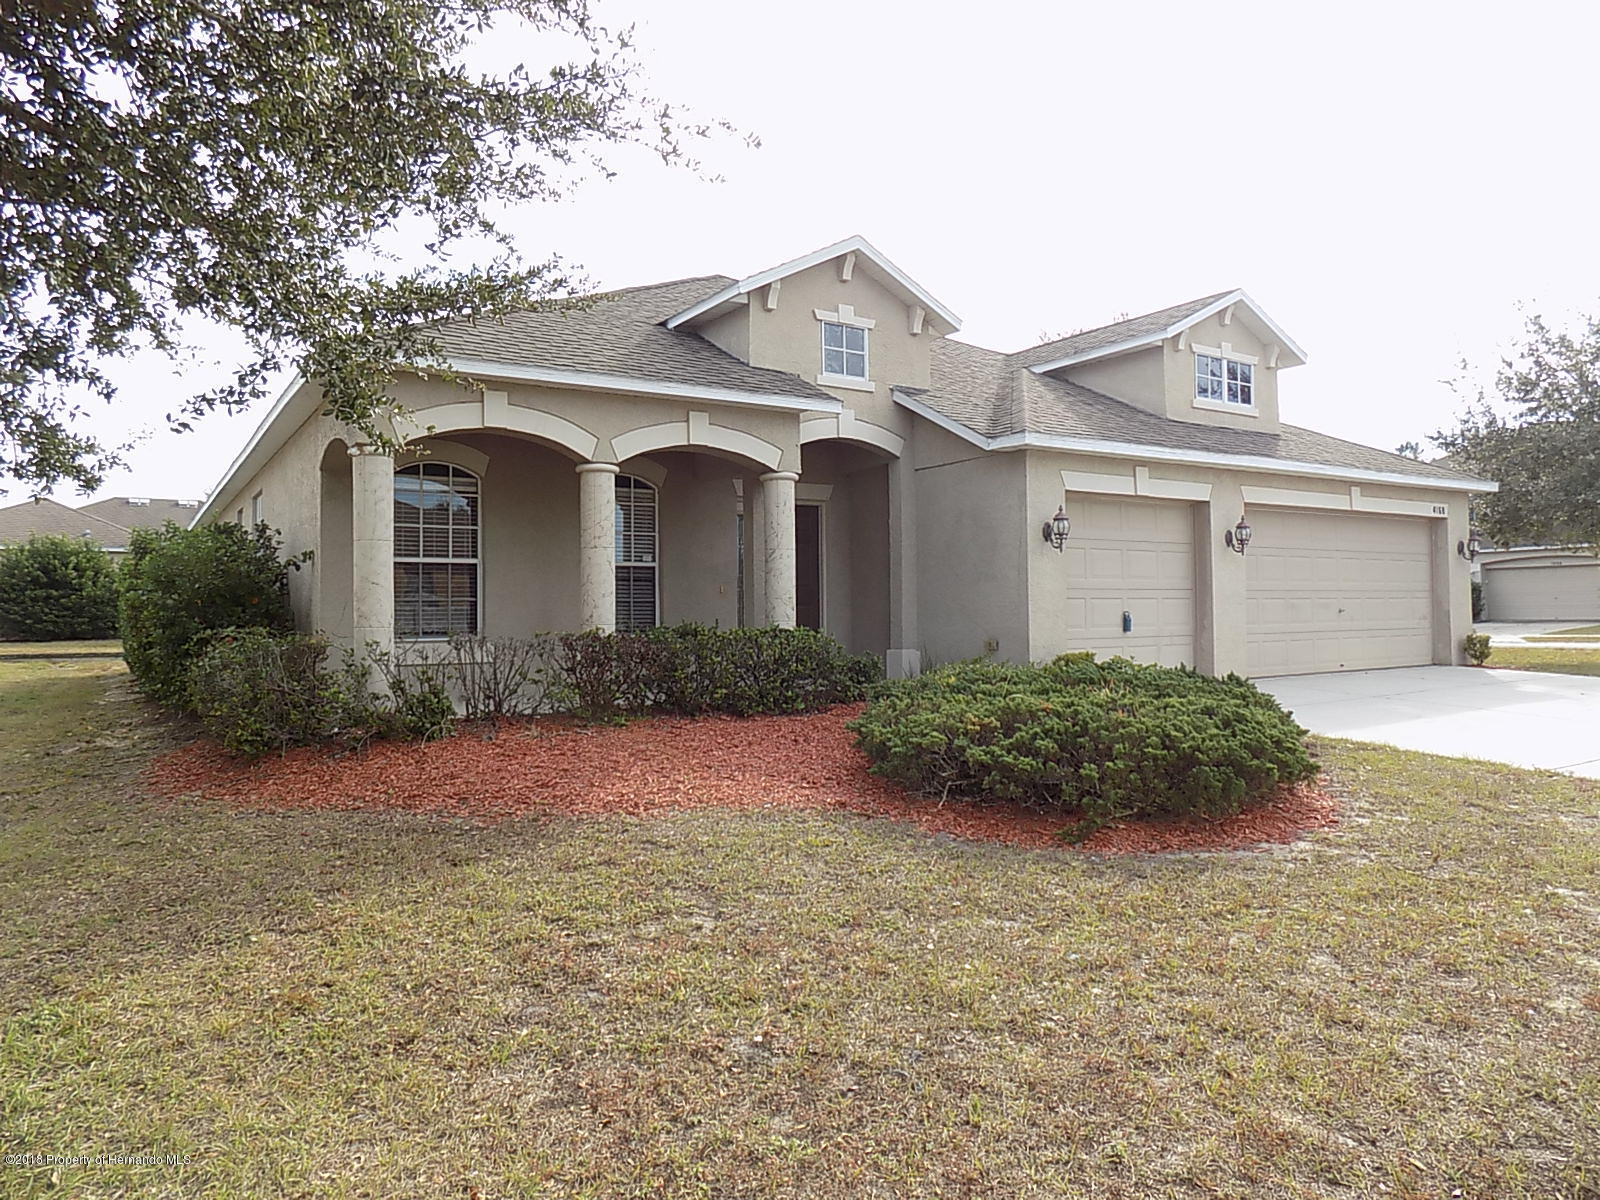 4168 Maplehurst Way, Spring Hill, Florida 34609, 4 Bedrooms Bedrooms, ,2 BathroomsBathrooms,Residential,For Sale,Maplehurst,2197401